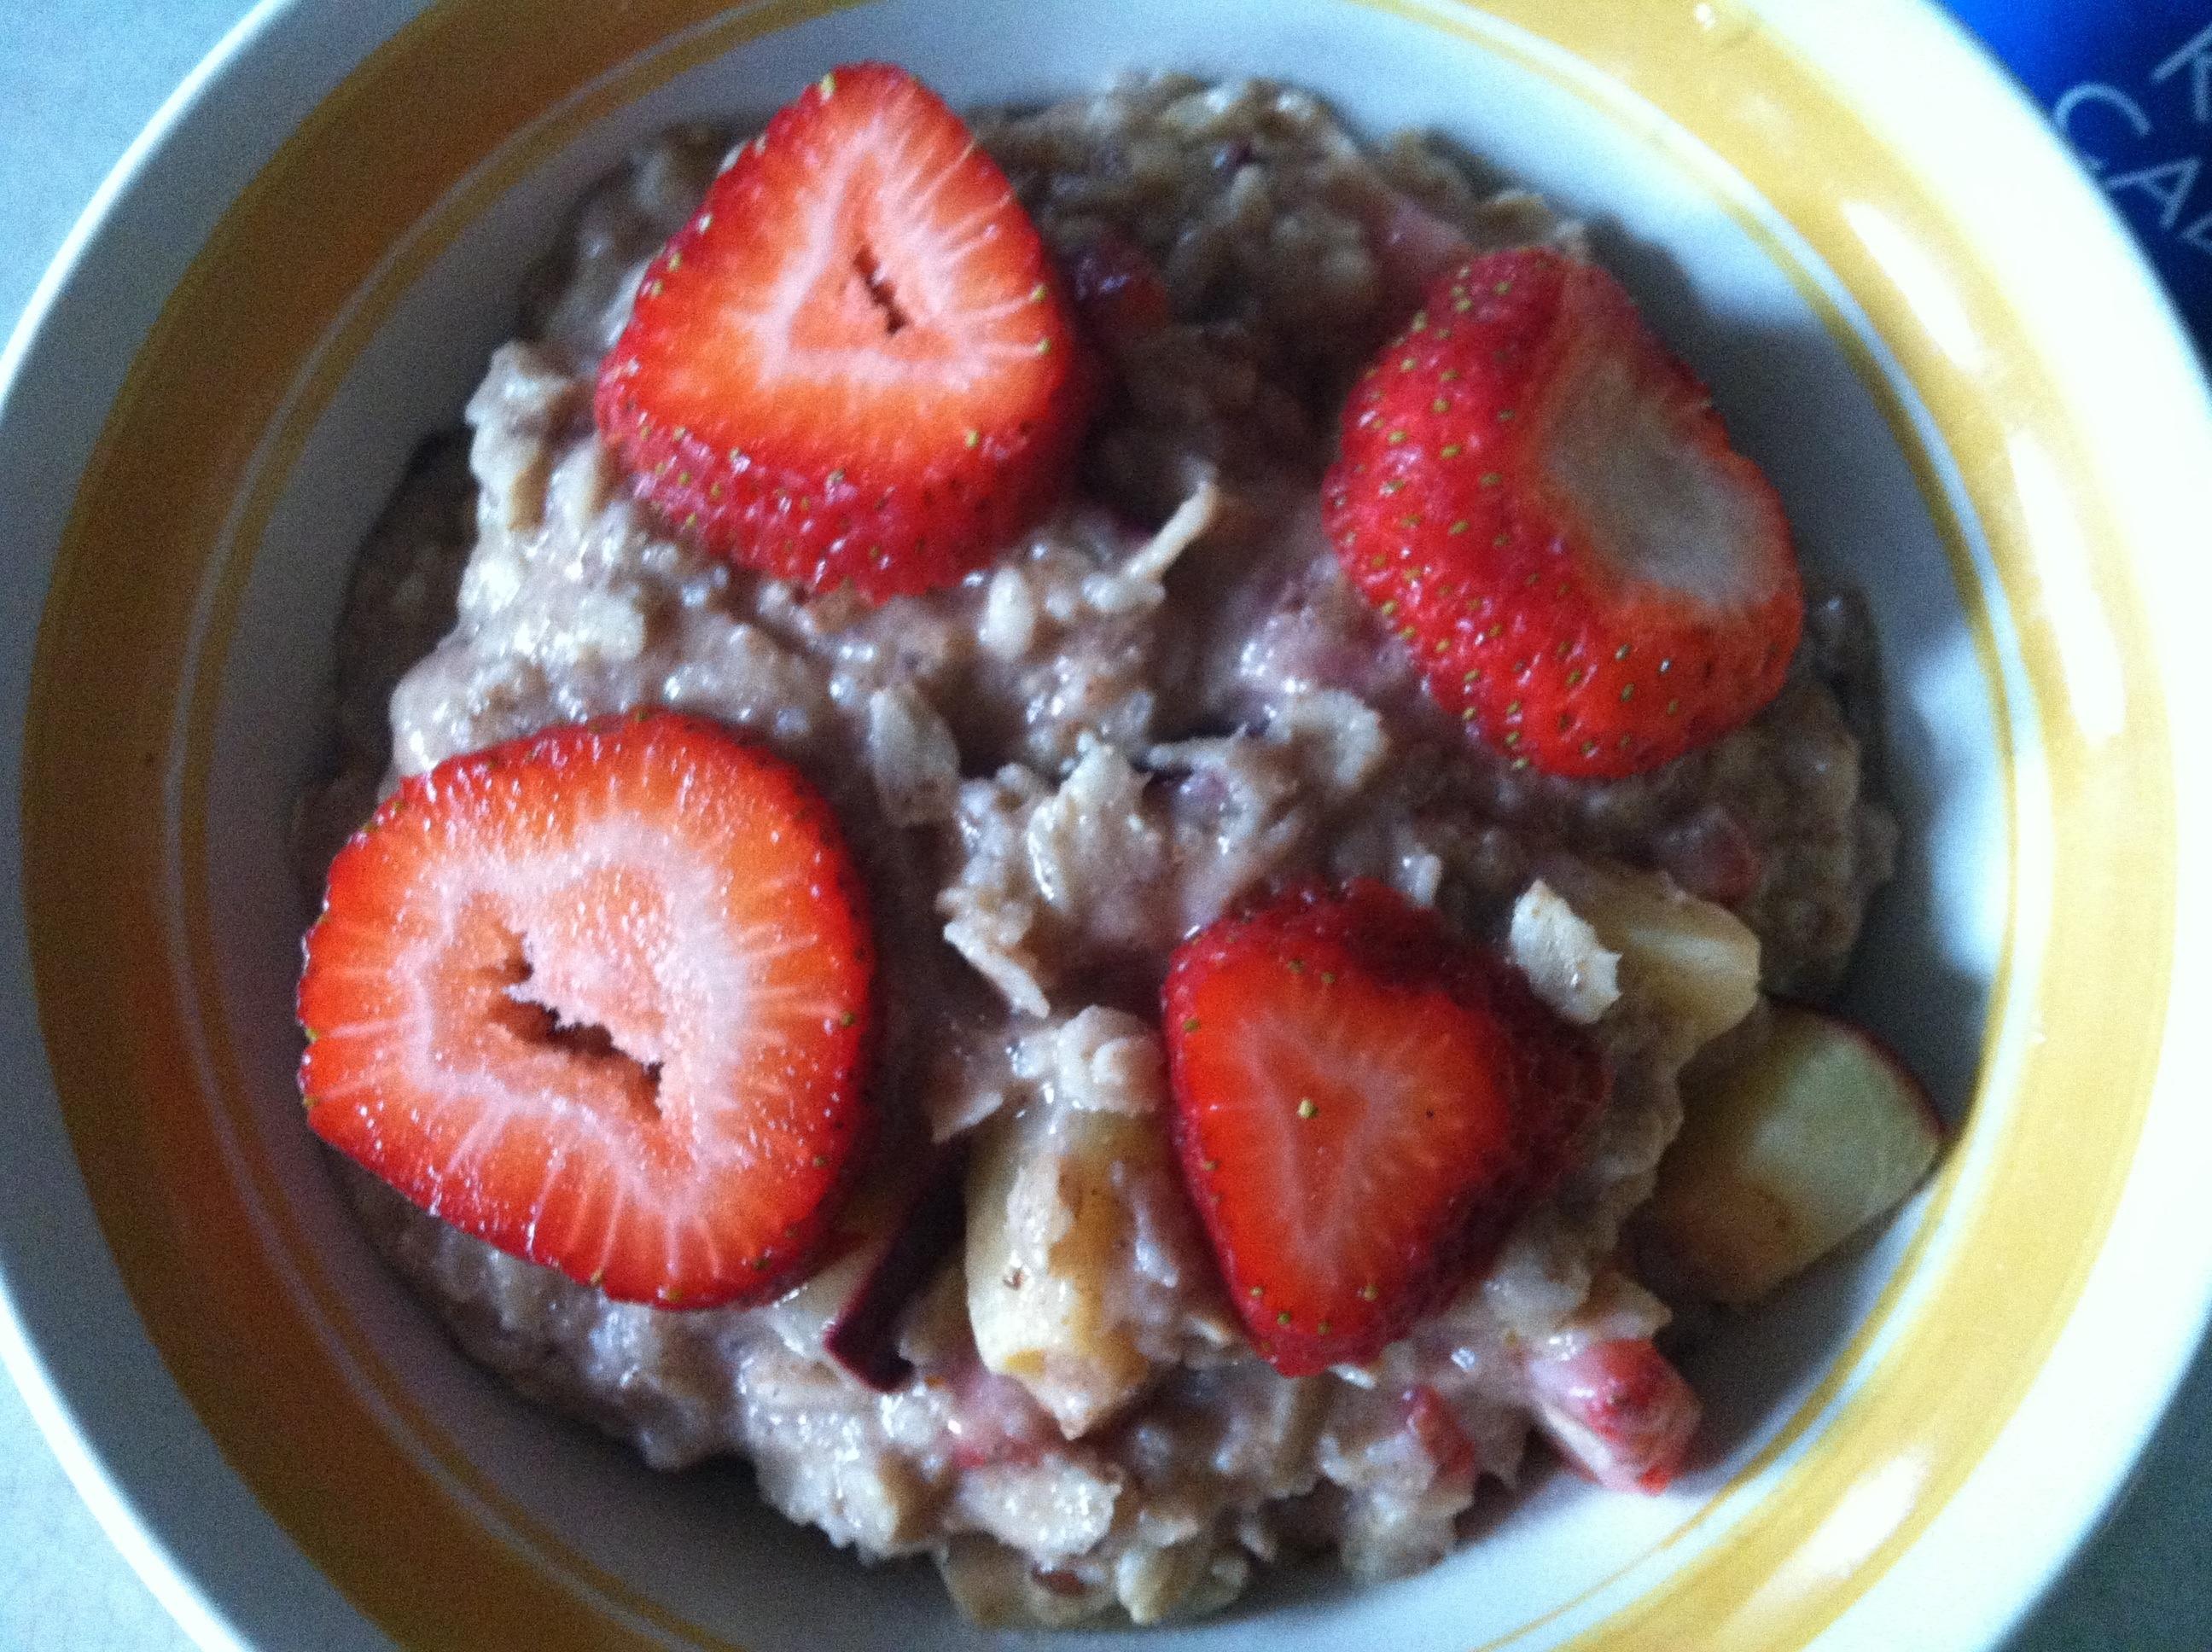 Plumberry Oatmeal